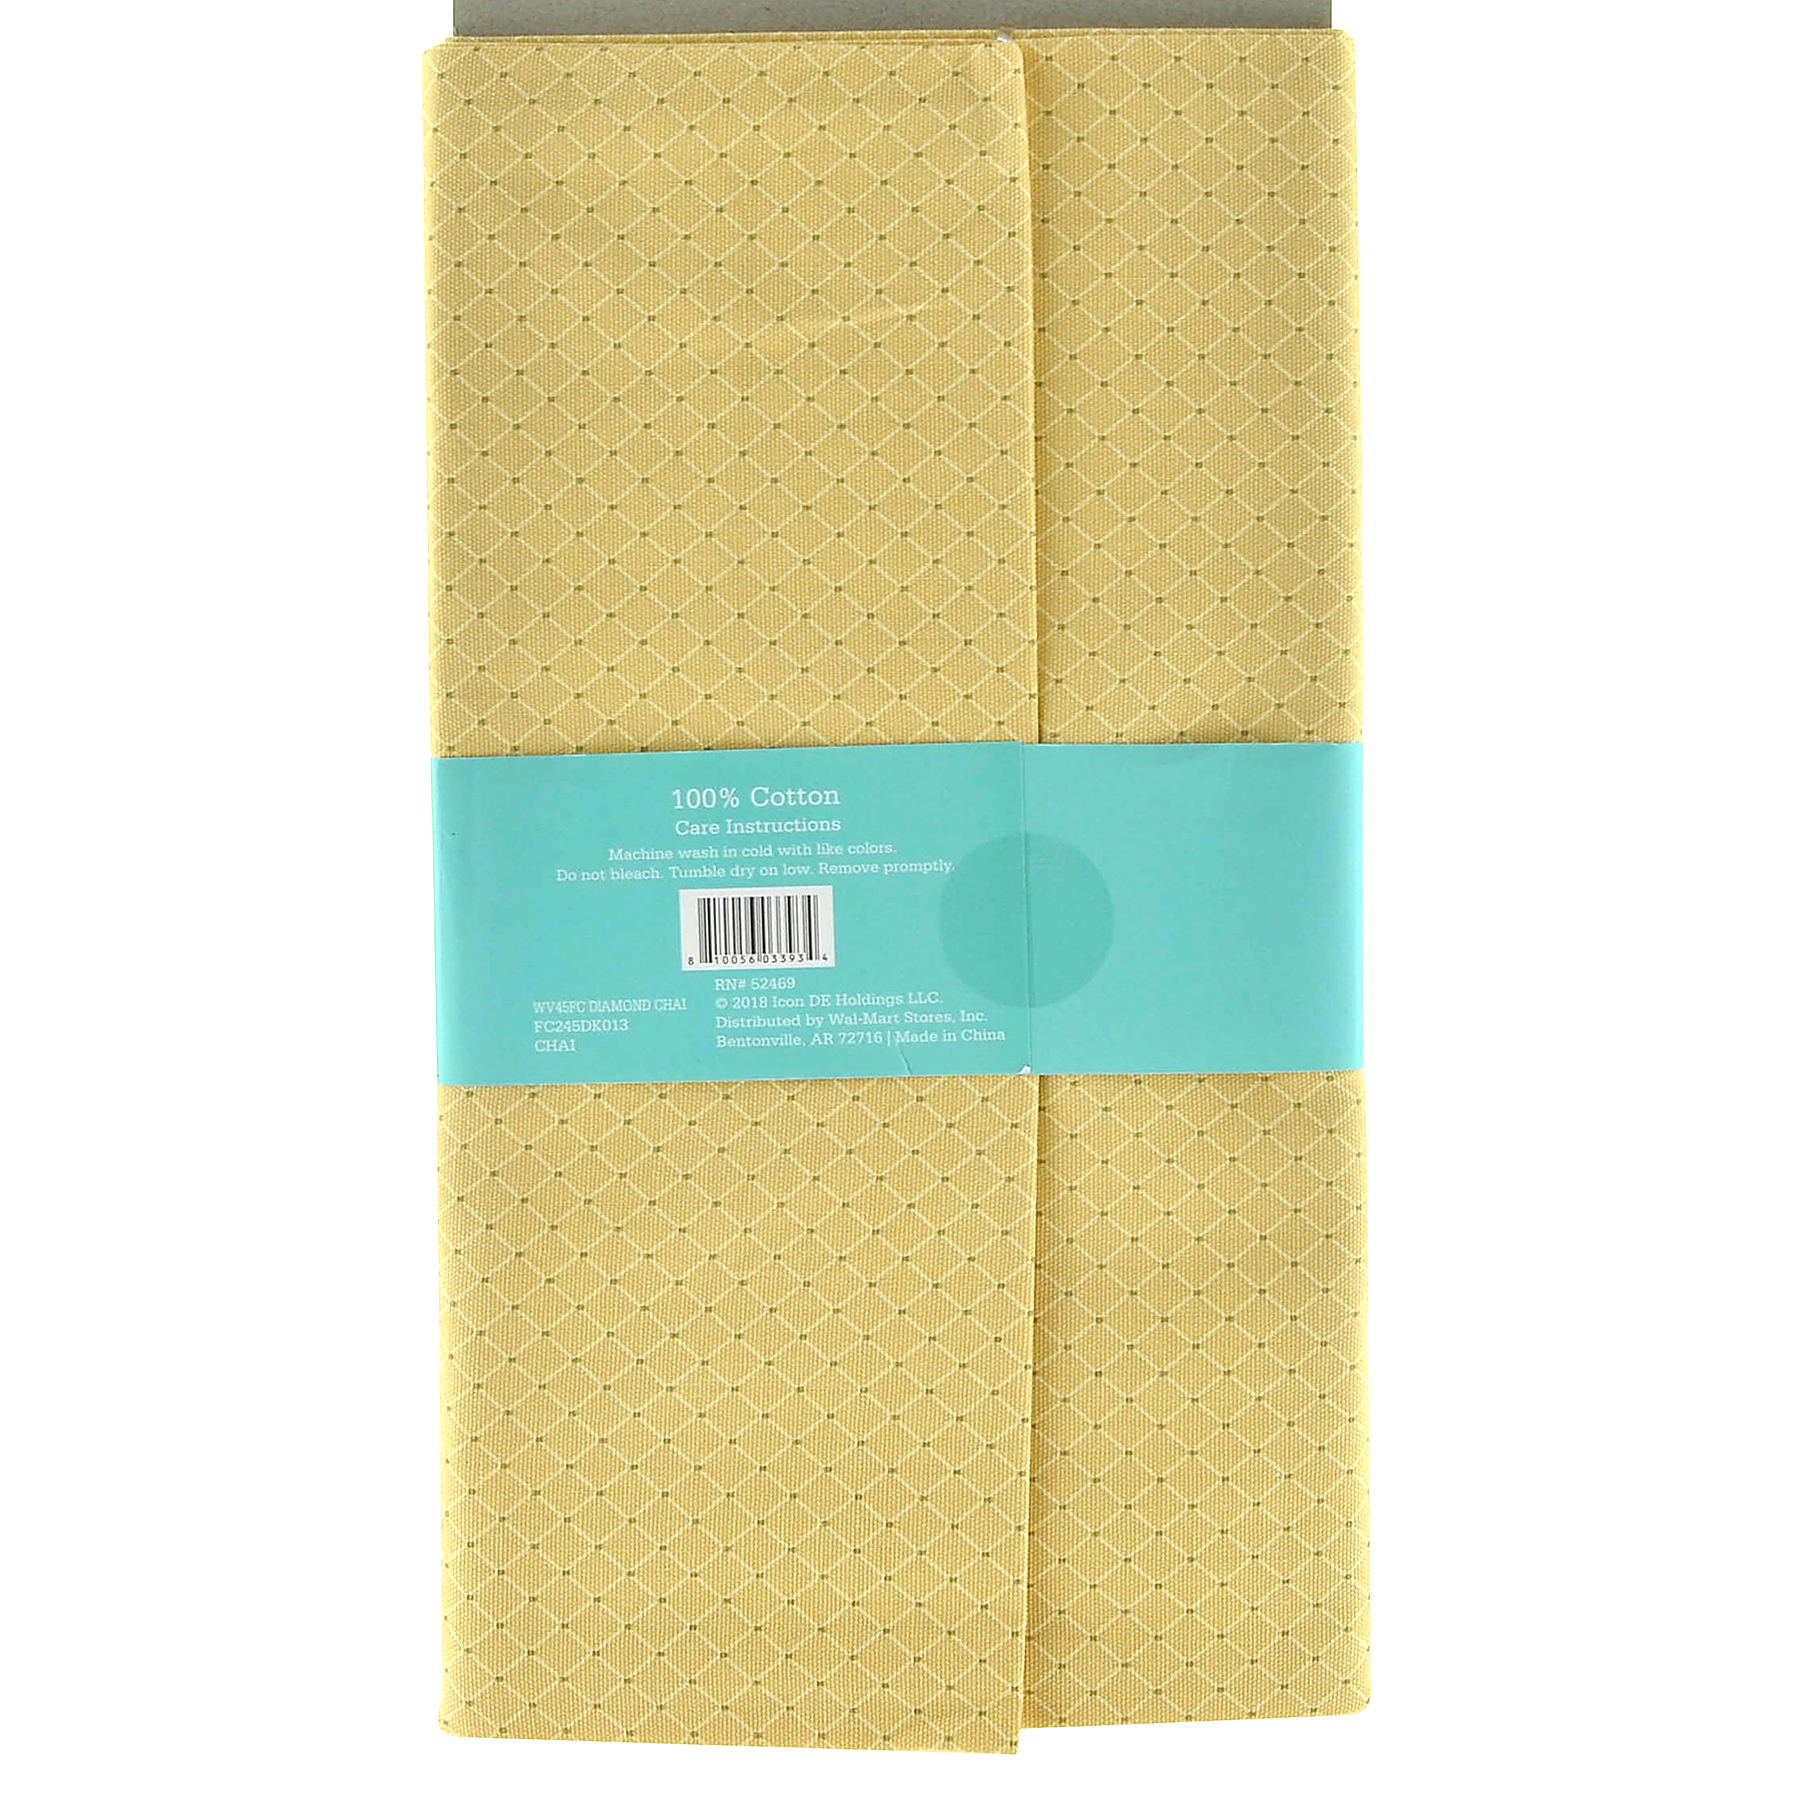 Waverly Inspirations 100% Cotton Duck Fabric, 2 yards, Diamond Chai